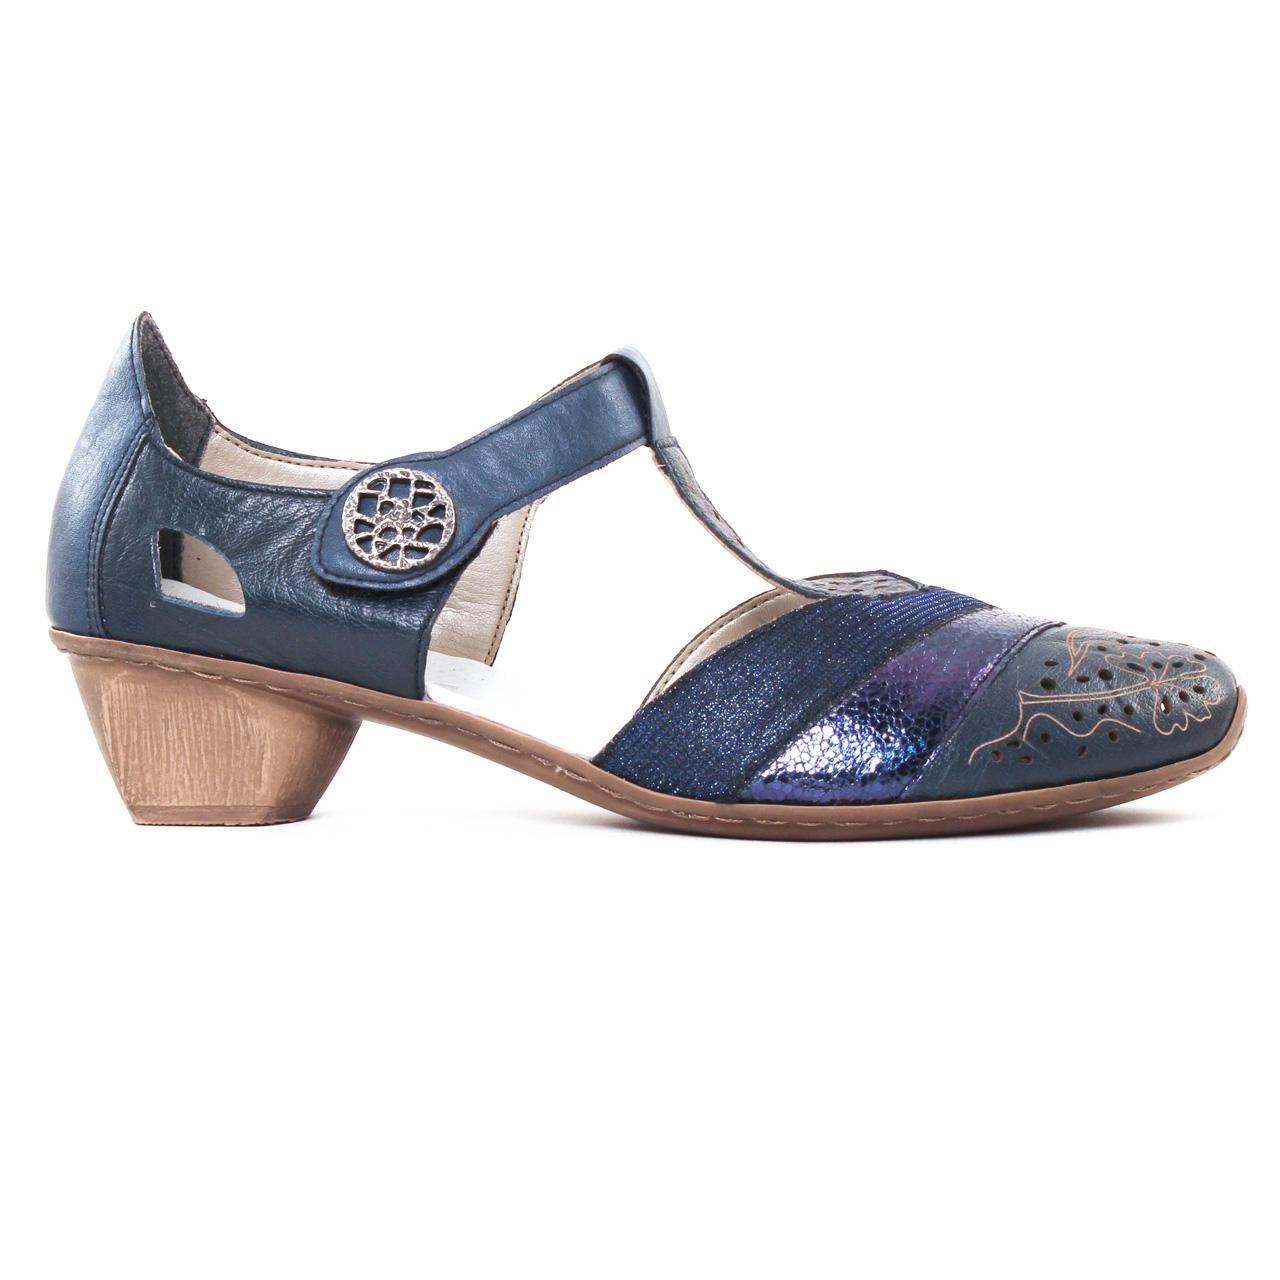 Chaussures Rieker Femme Bleu Royalgrey Polo Bdpcwdky Compensées SwqZawf